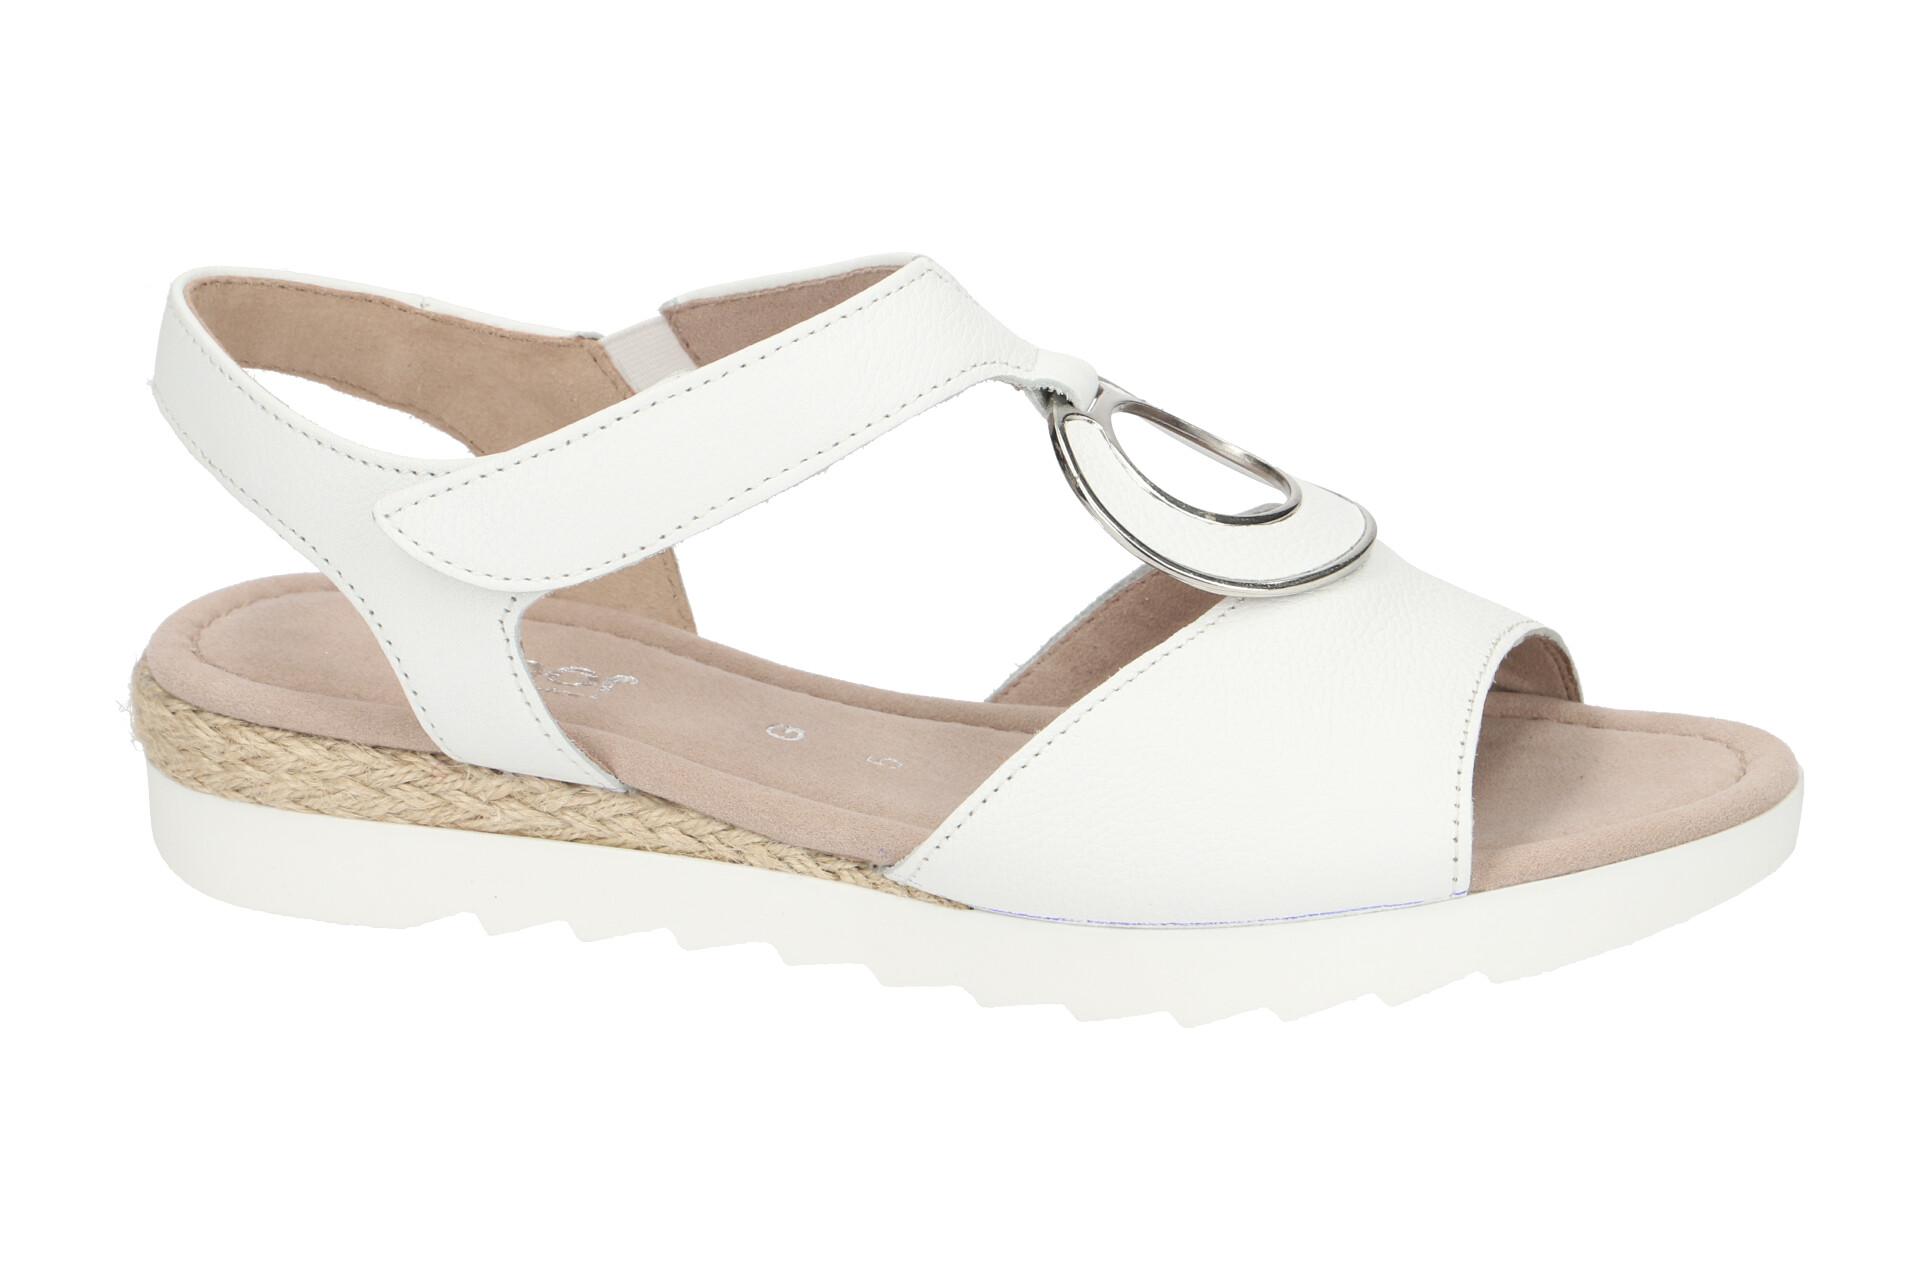 Gabor Schuhe RHODOS weiß Damen Sandale Sandaletten 22.745.50 NEU | eBay